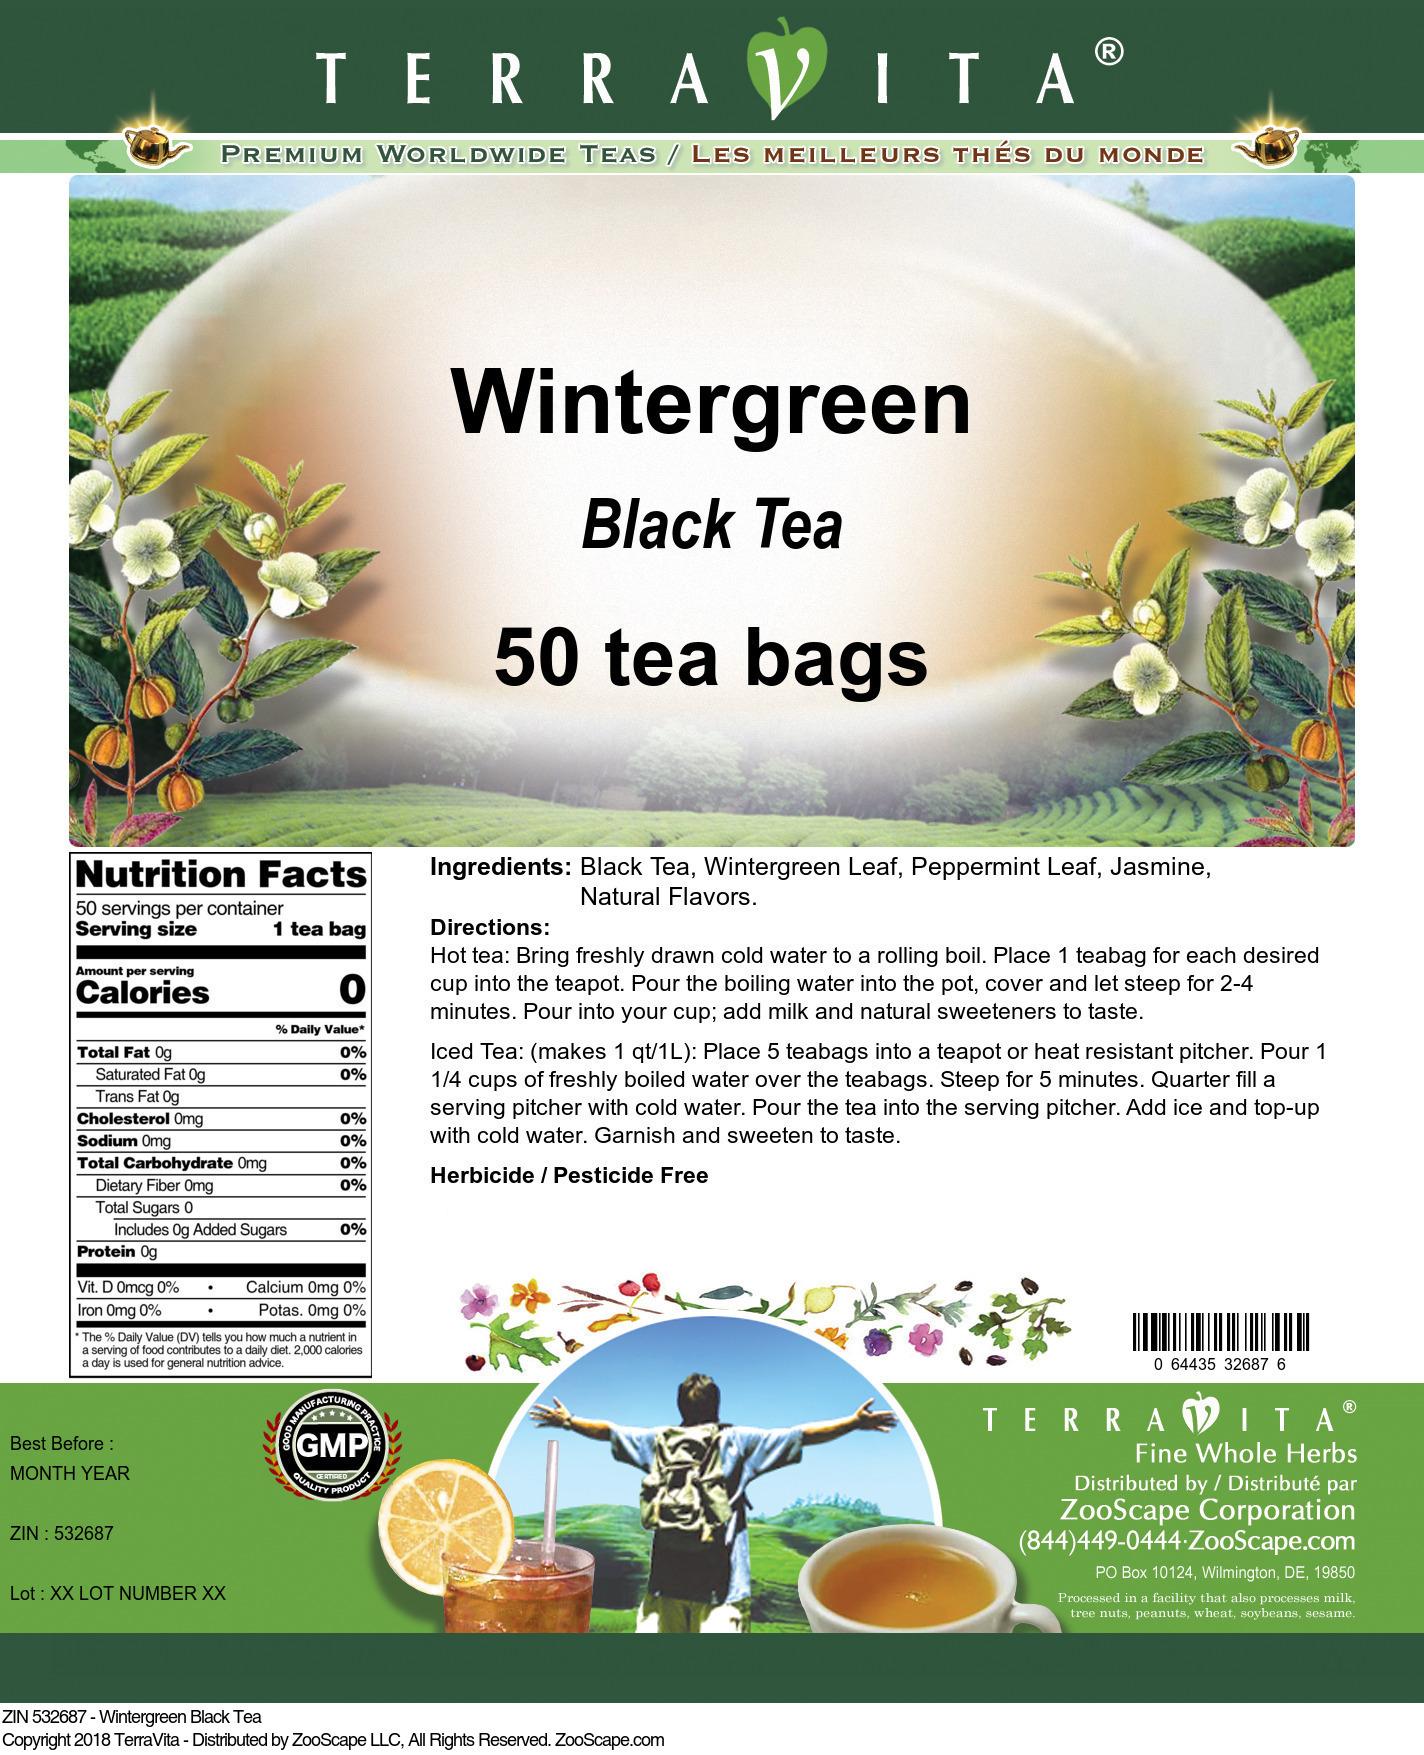 Wintergreen Black Tea